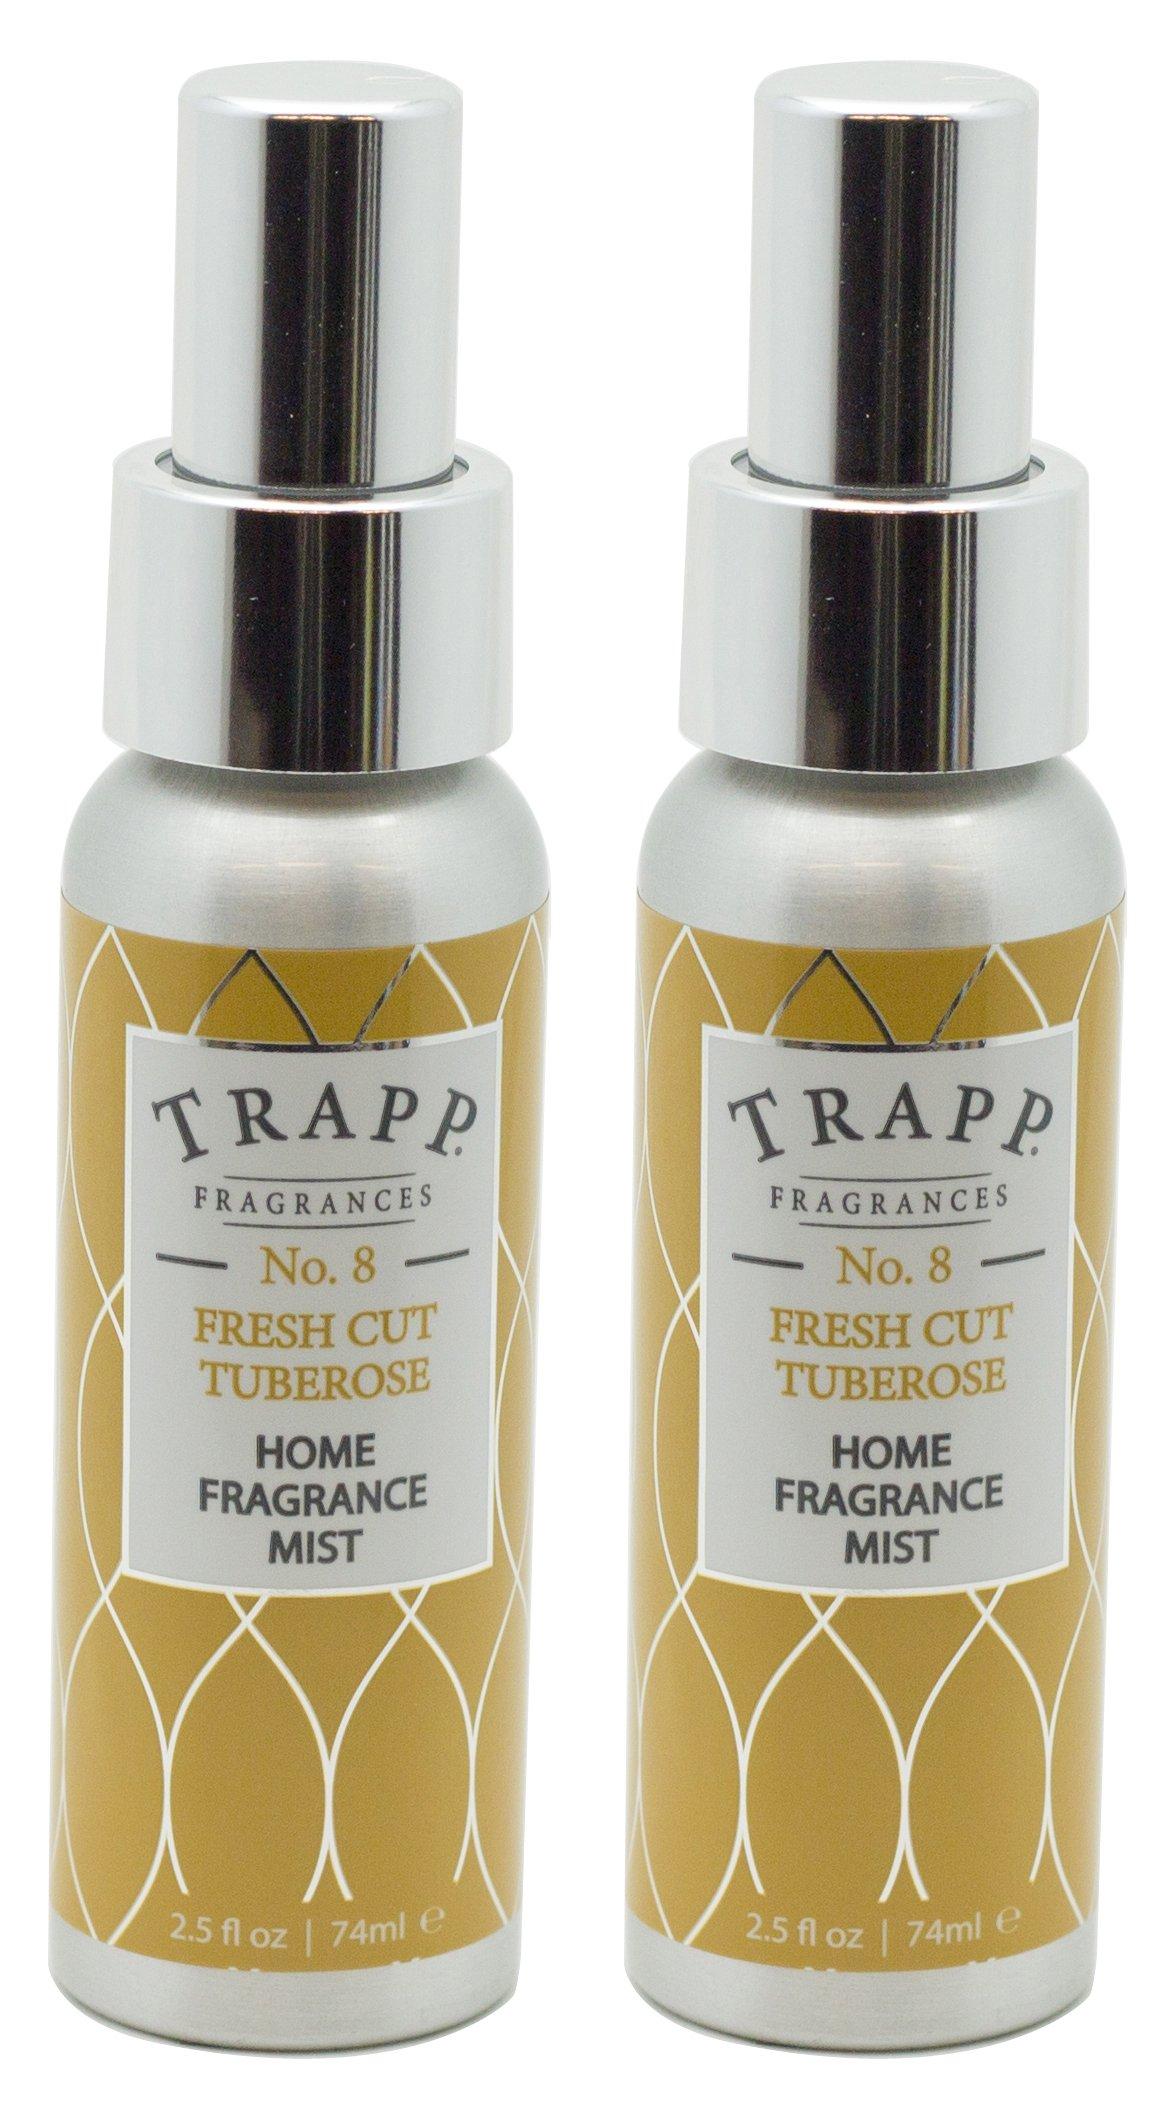 Trapp Home Fragrance Mist, No. 8 Fresh Cut Tuberose, 2.5-Ounce (2-Pack)